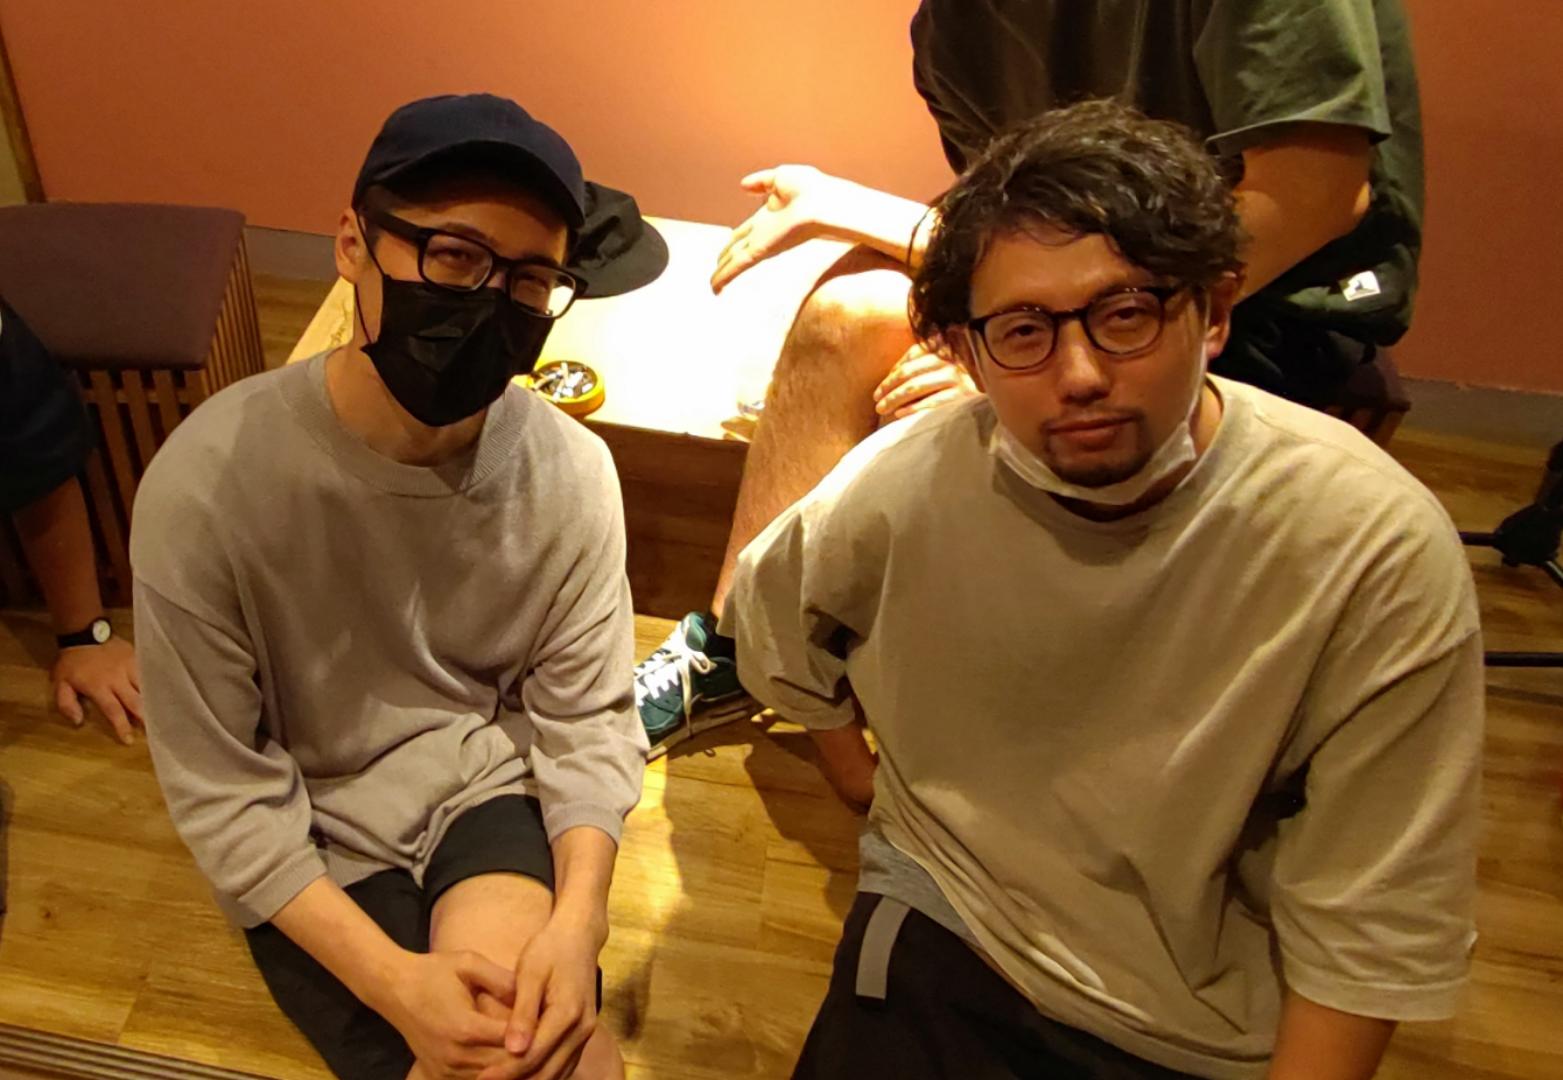 【RADIOウェイヨー軒 #16】「あるバンドマンの肖像」MC:satch/Guest:suugayuuuu(JOHNNYPARK)